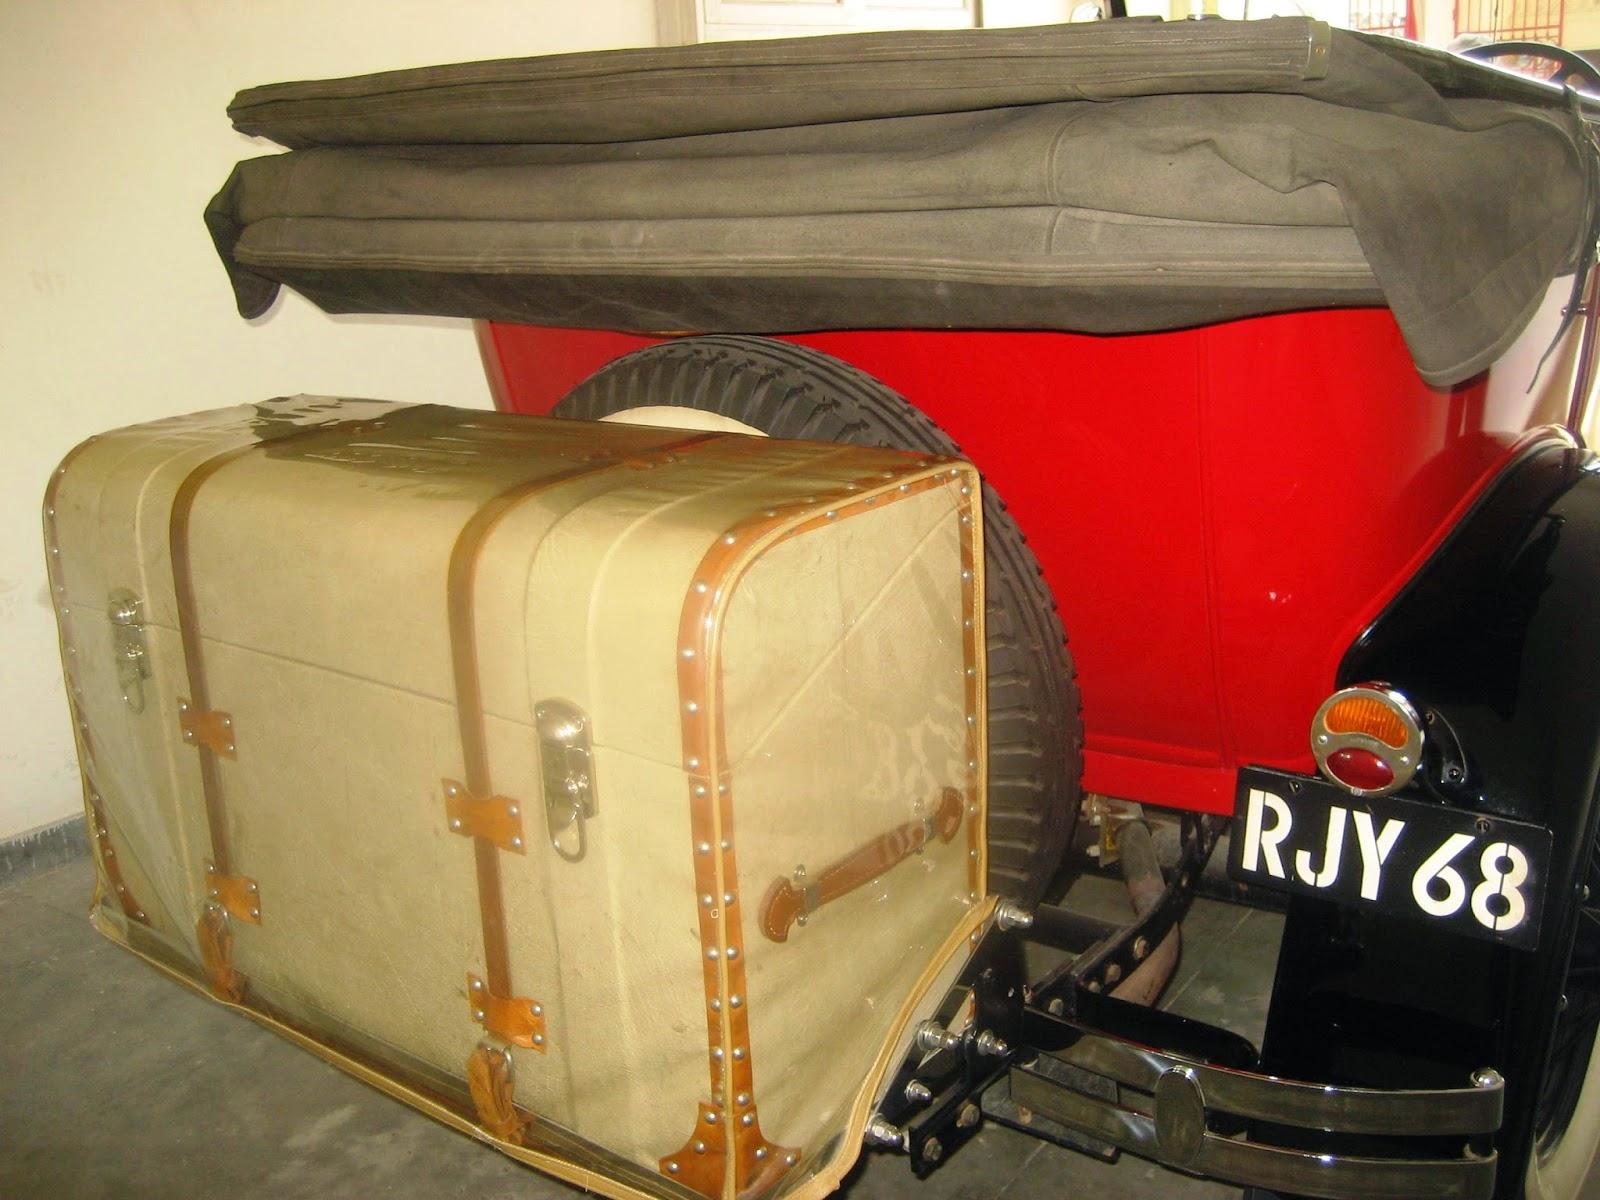 triumph rajasthan royals bag